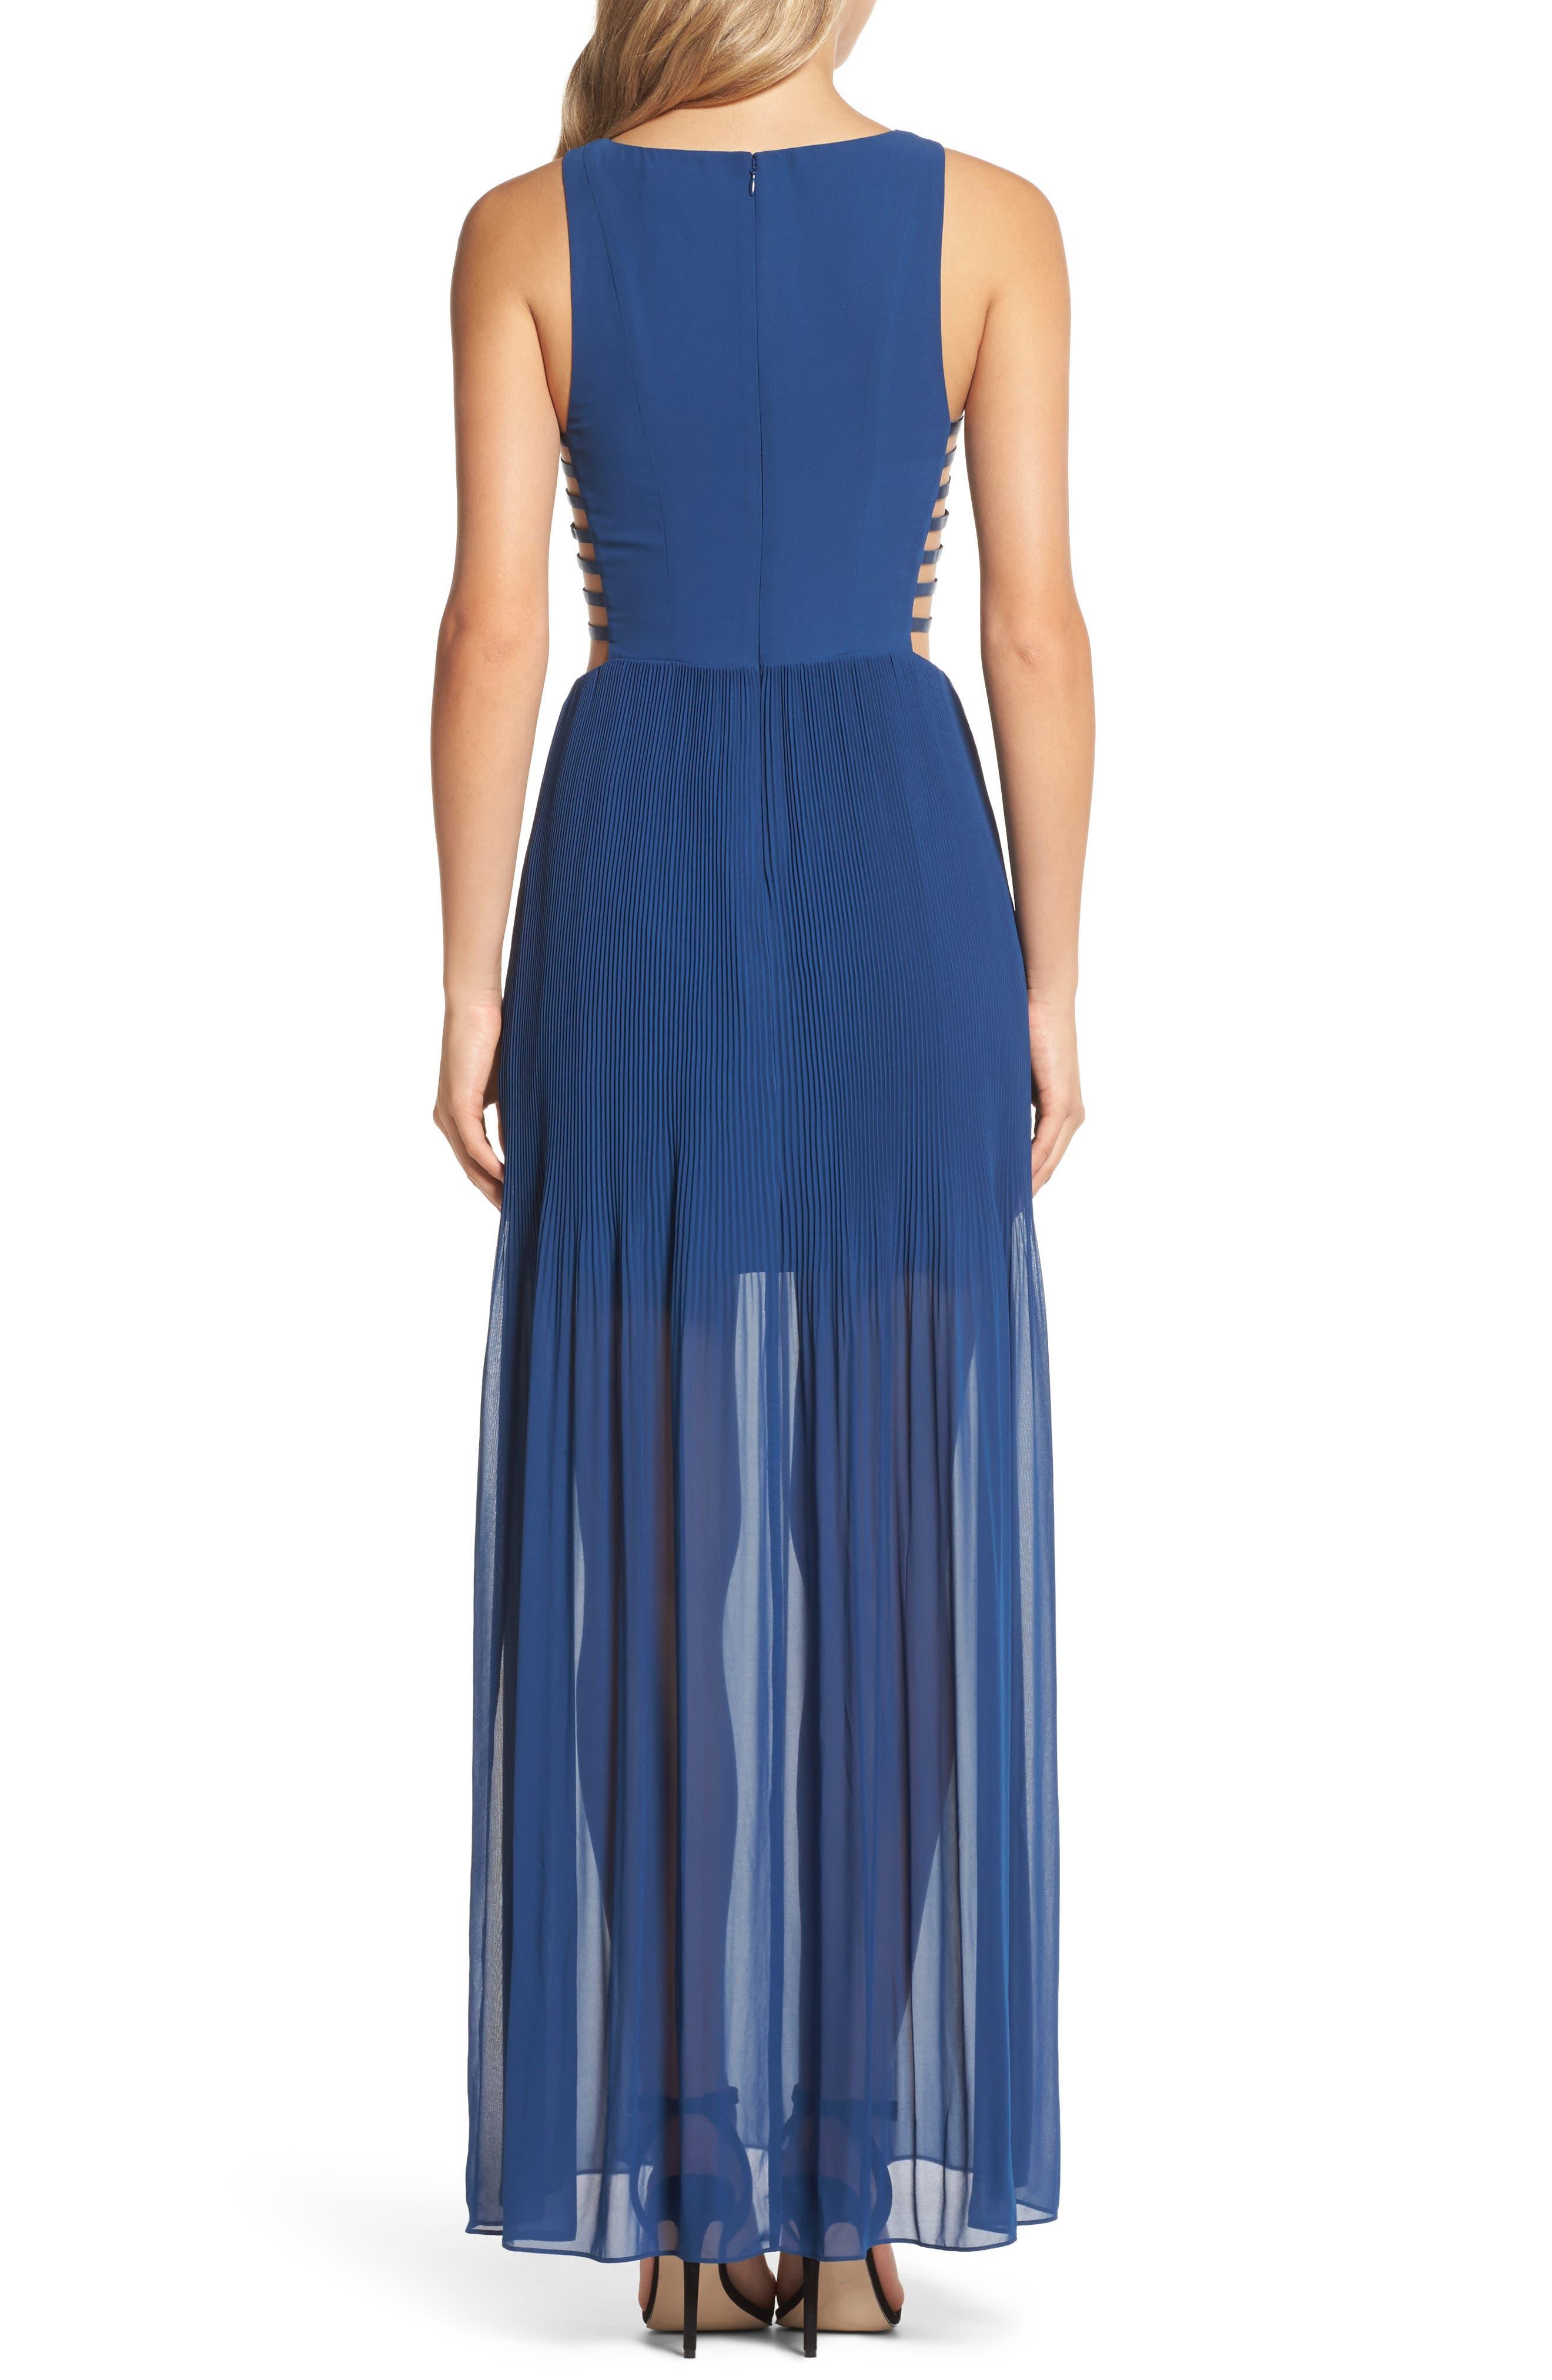 Sunset Blvd Maxi Dress,                             Alternate thumbnail 3, color,                             French Blue